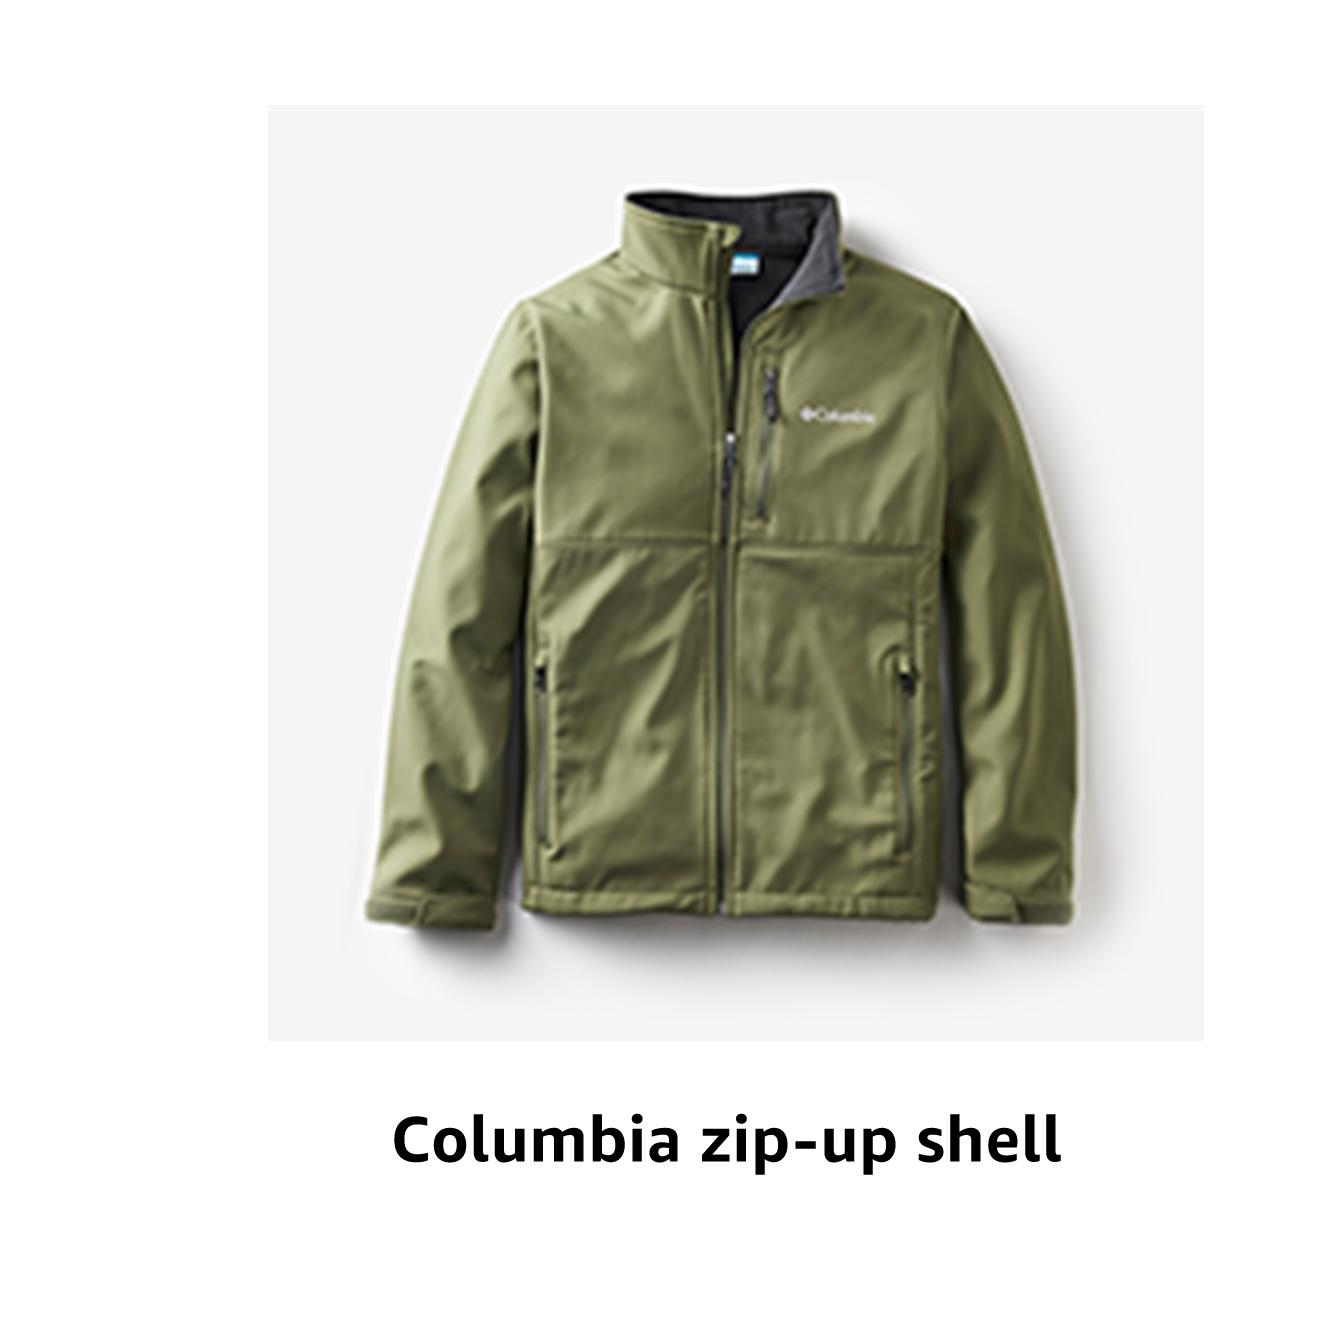 Columbia zip-up shell